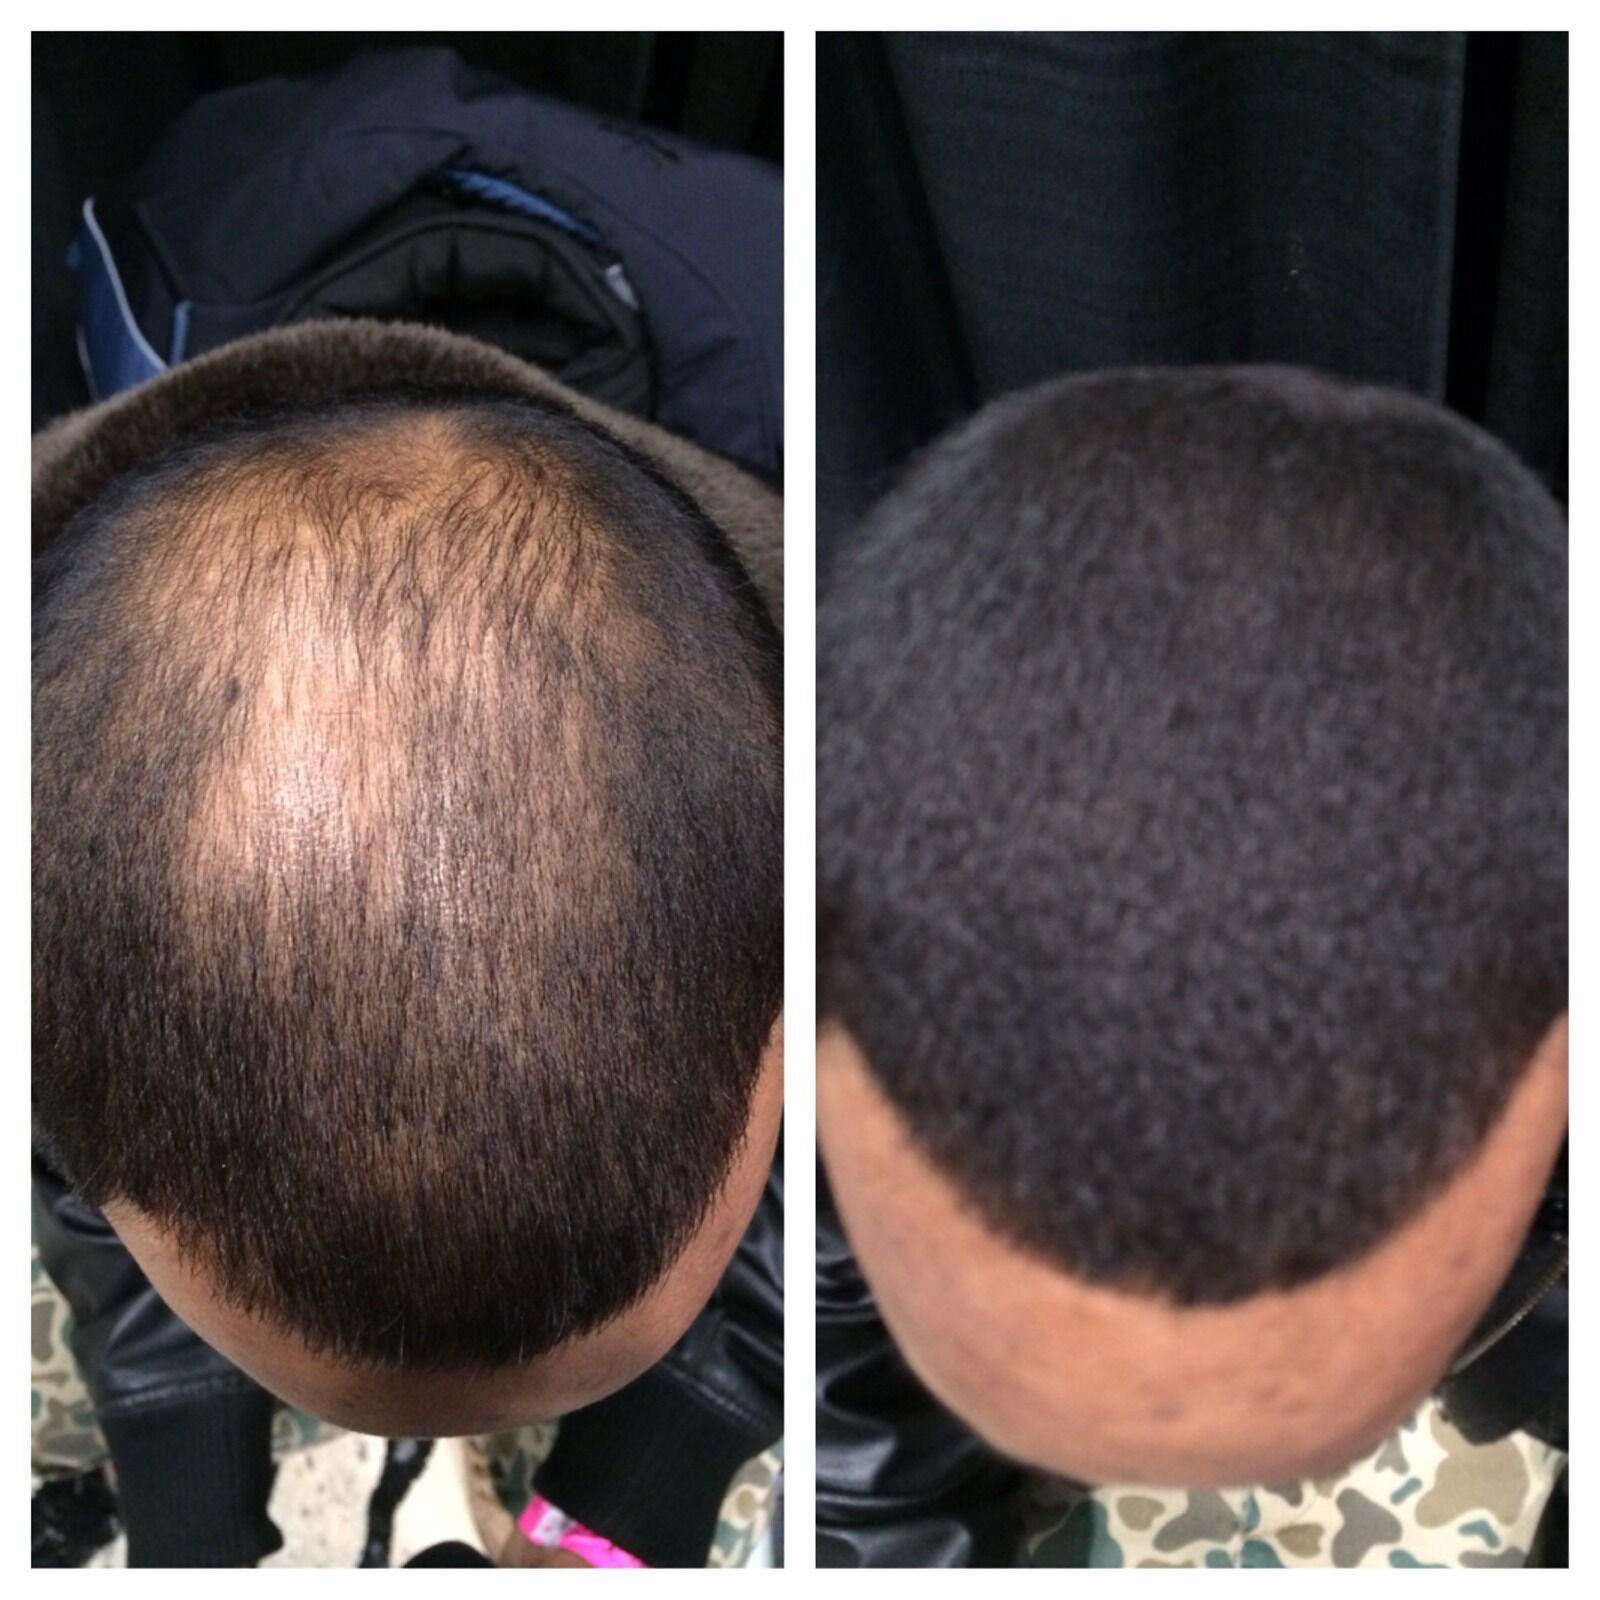 Hair Illusion Hair Fibers Extensions For Balding Thinning Hair Black